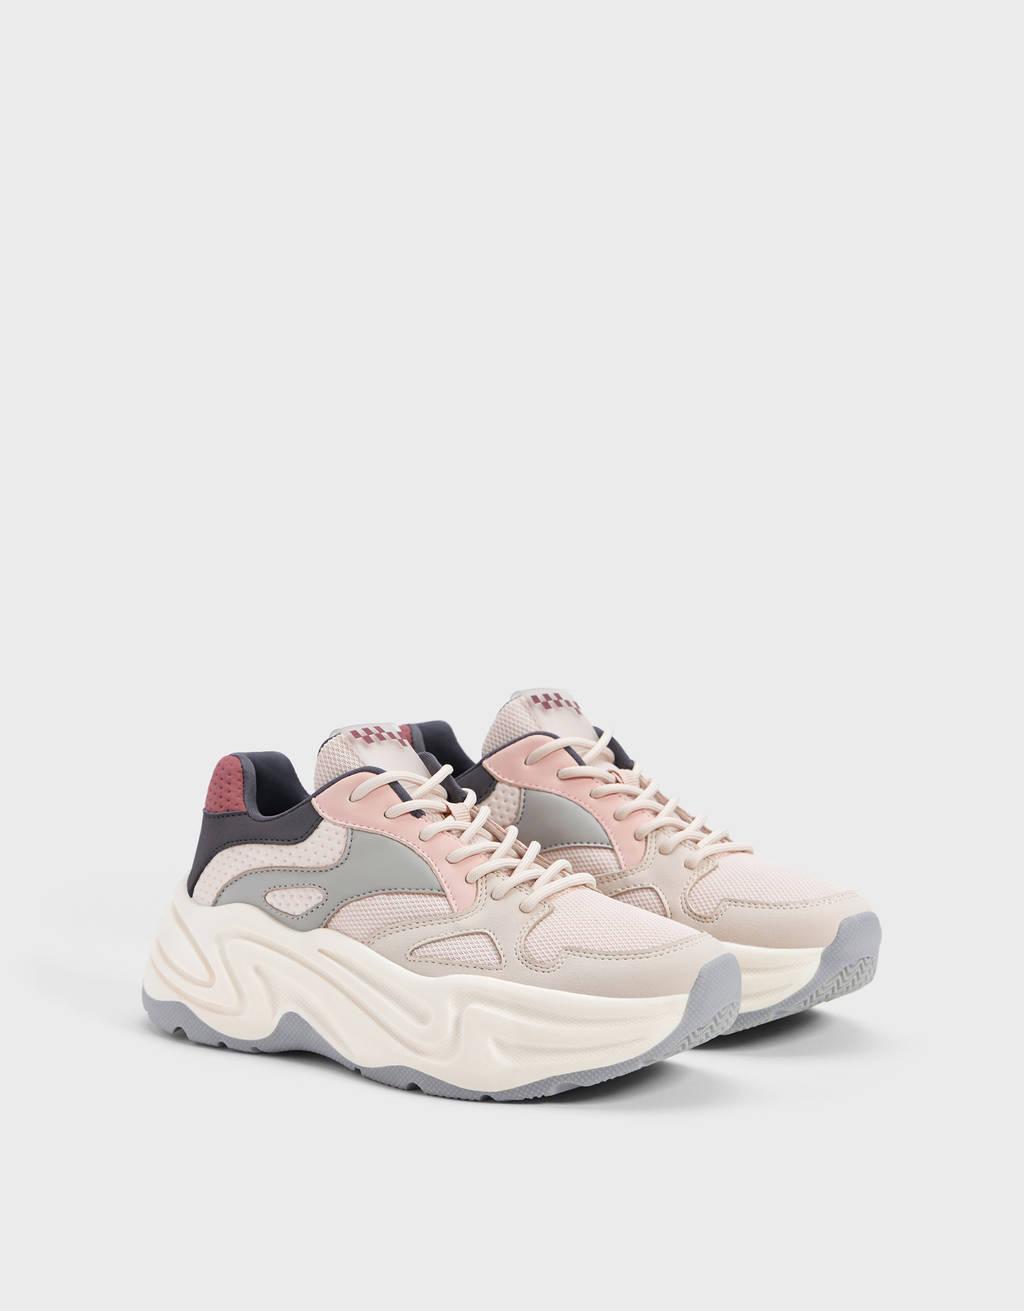 Sneakers combinate suola XL